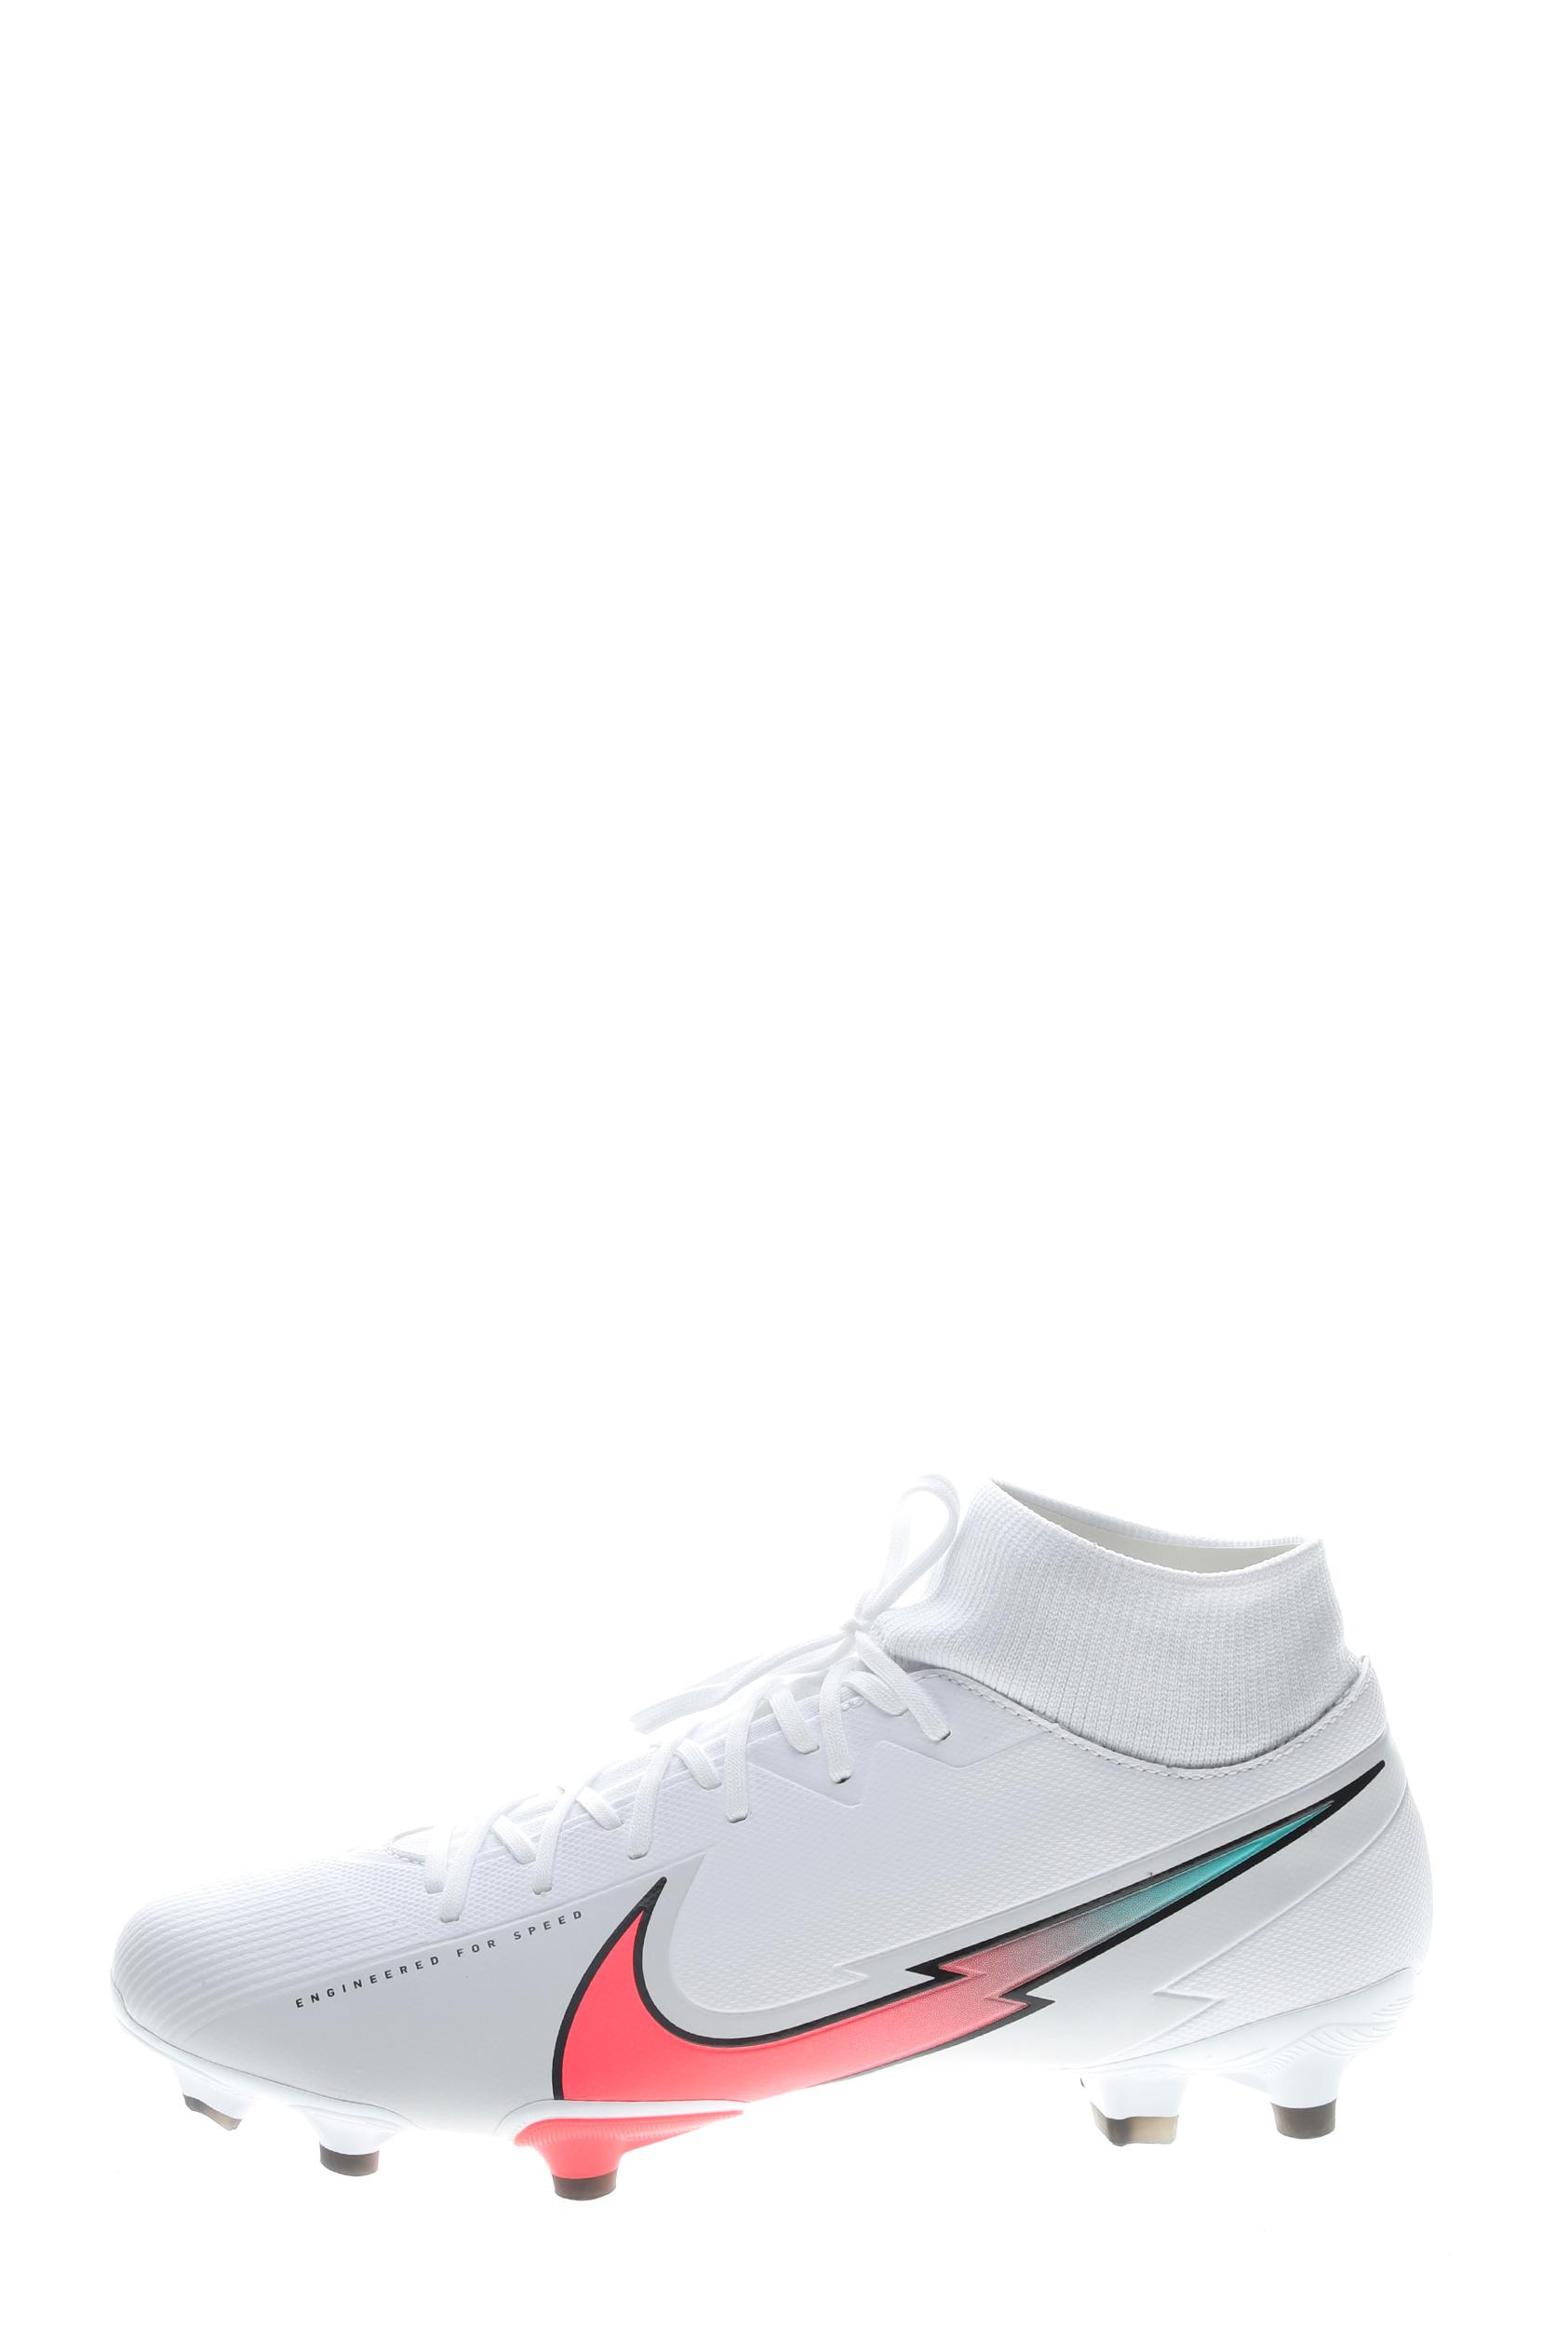 NIKE – Unisex παπούτσια football NIKE SUPERFLY 7 ACADEMY FG/MG λευκά